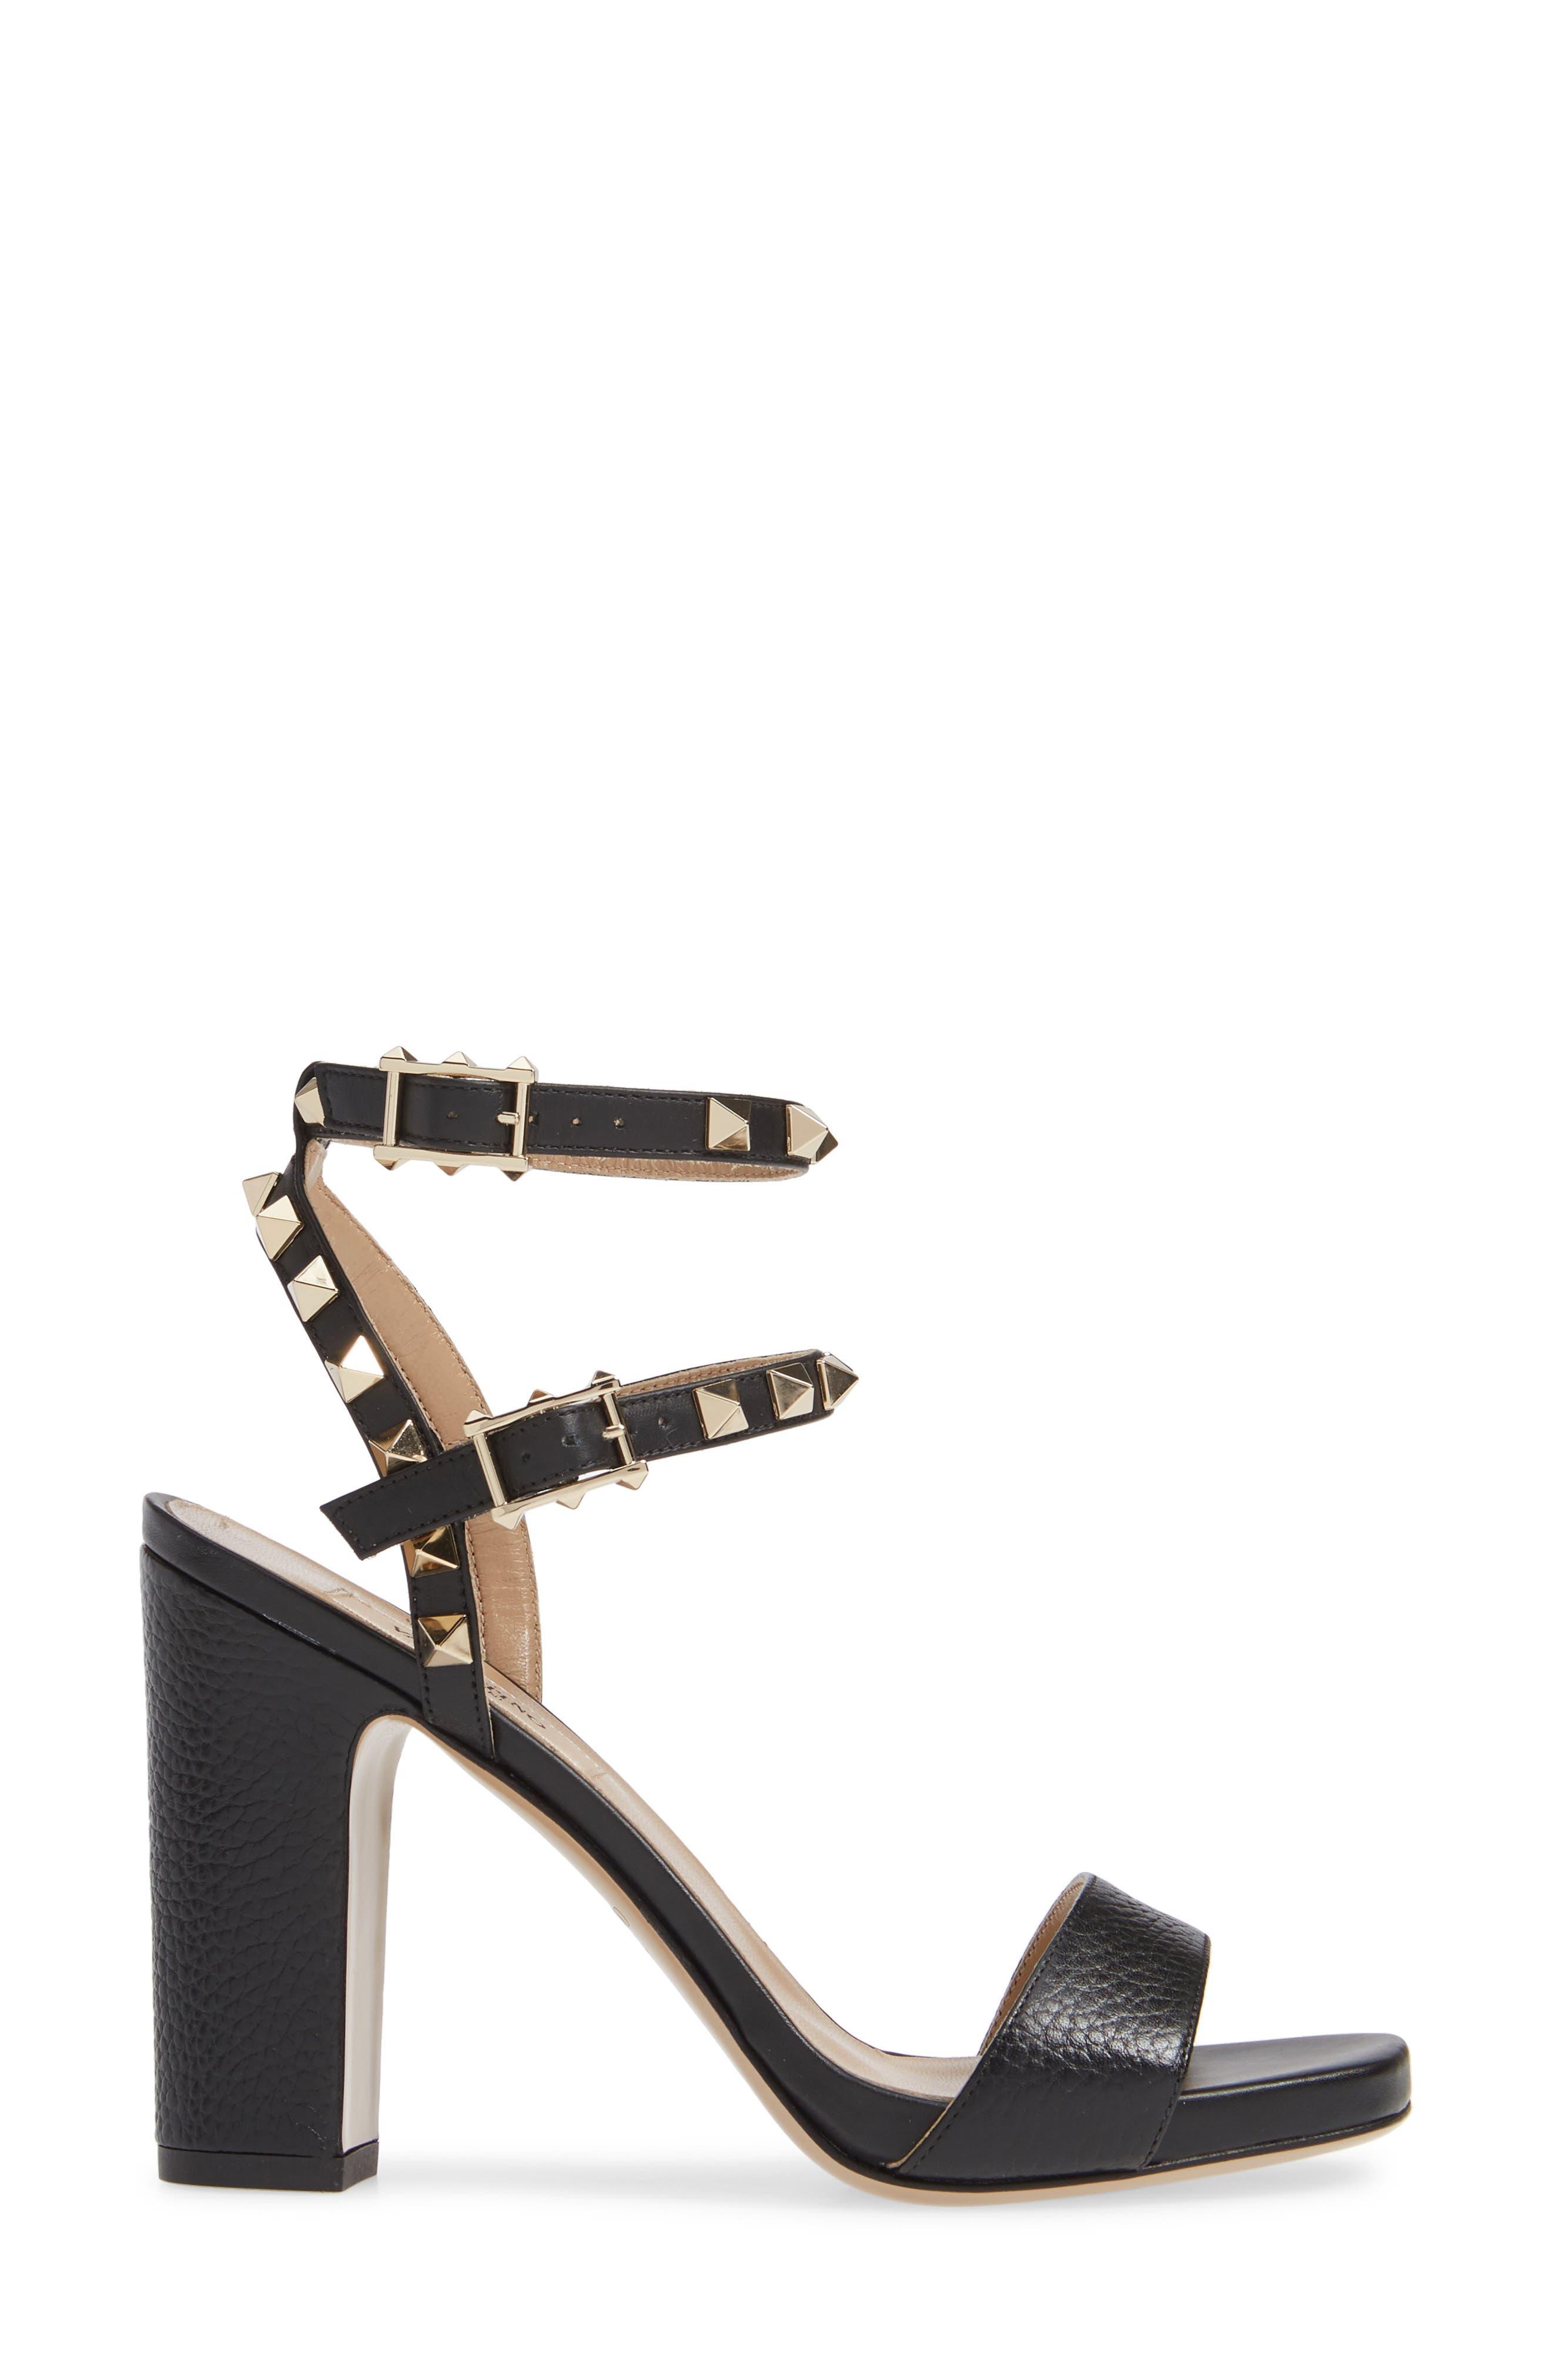 VALENTINO GARAVANI, Rockstud Ankle Strap Block Sandal, Alternate thumbnail 3, color, BLACK/ BLACK